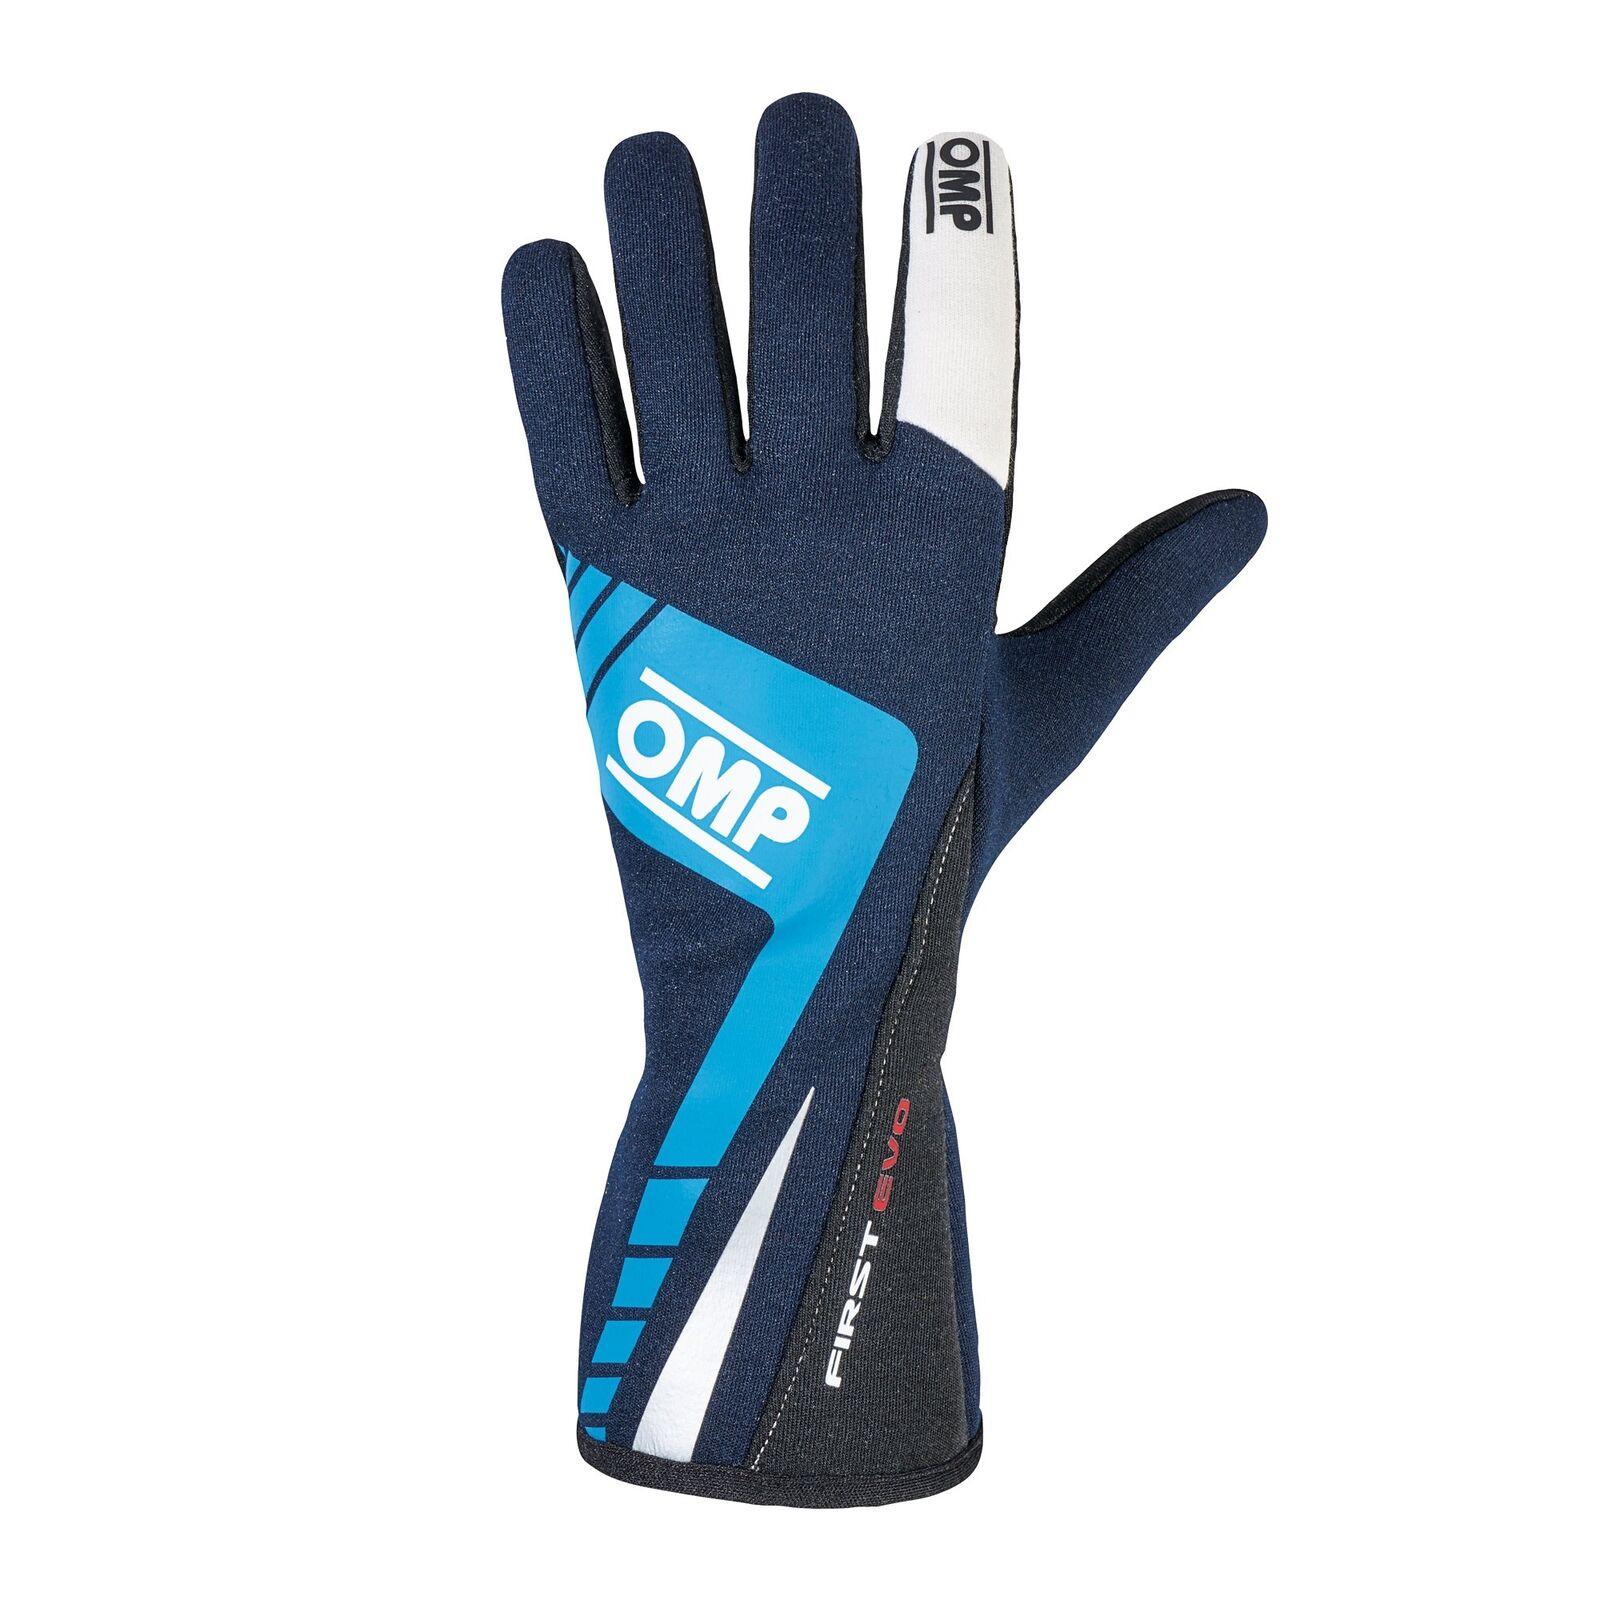 OMP FIRST EVO Racing Gloves | FIA 8856-2000 Holomogation | IB/757E